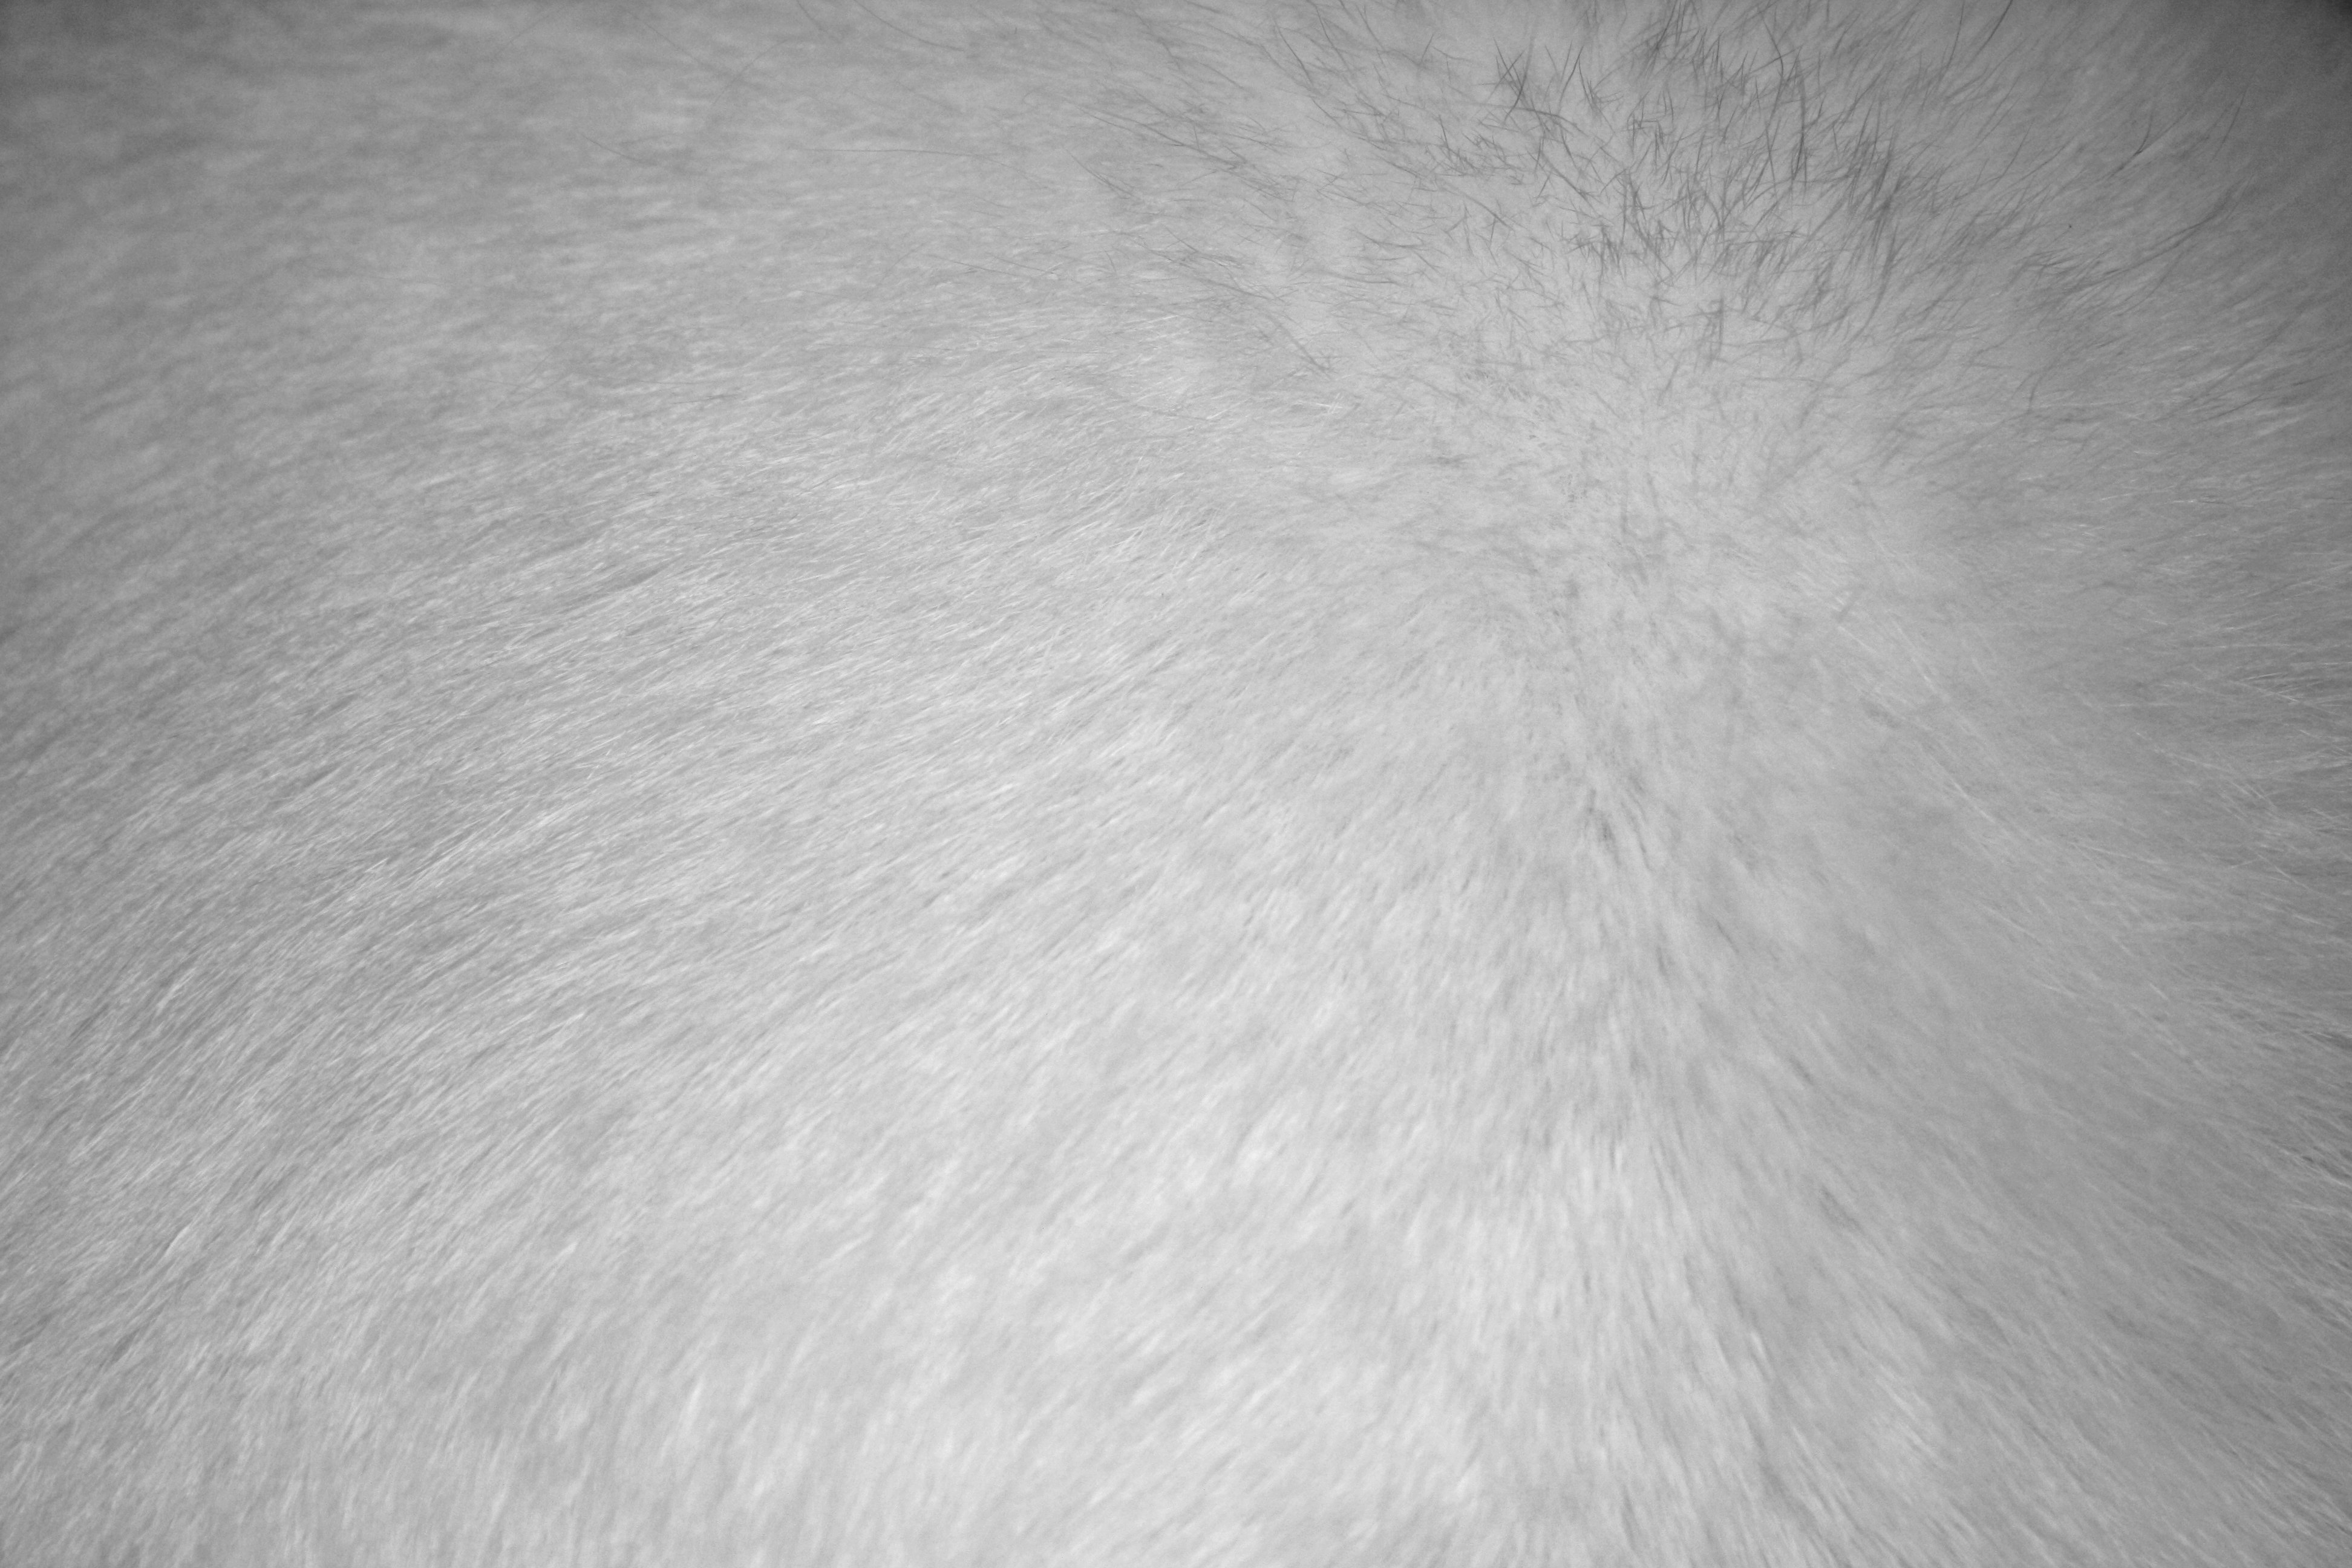 Fur texture clipart clipart free stock White Fur Texture Picture | Free Photograph | Photos Public Domain clipart free stock